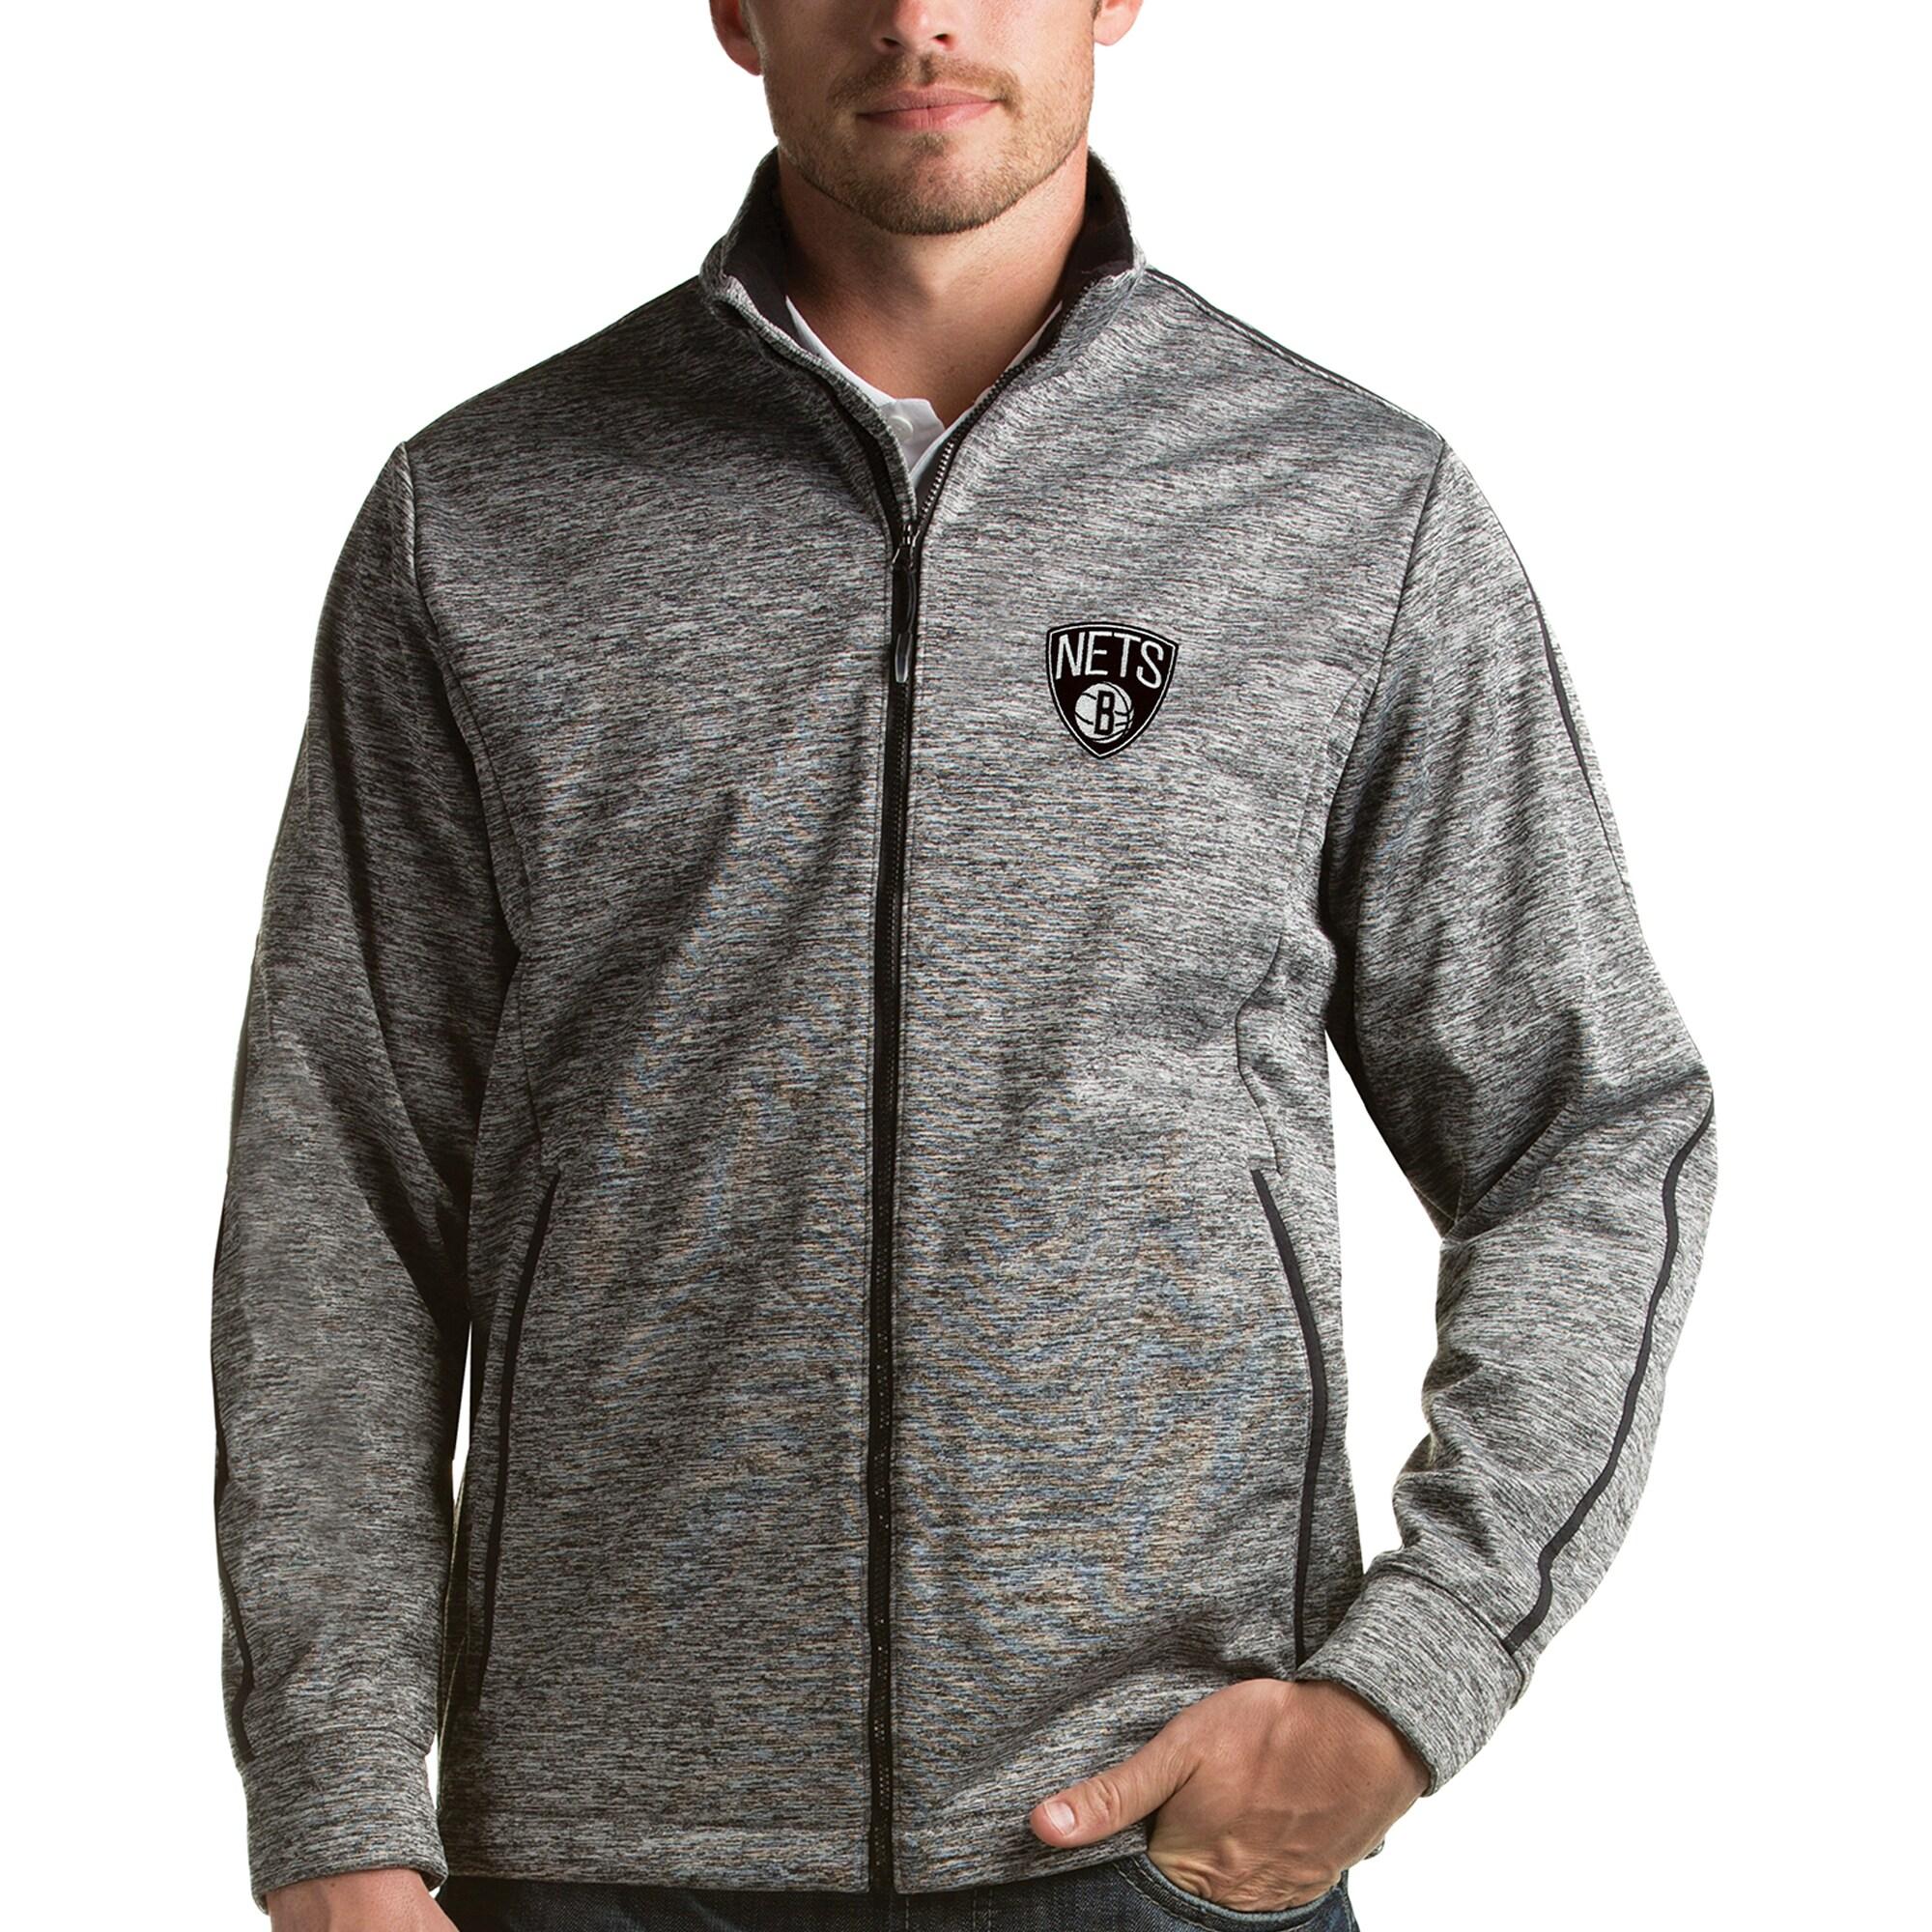 Brooklyn Nets Antigua Golf Full-Zip Jacket - Heather Gray